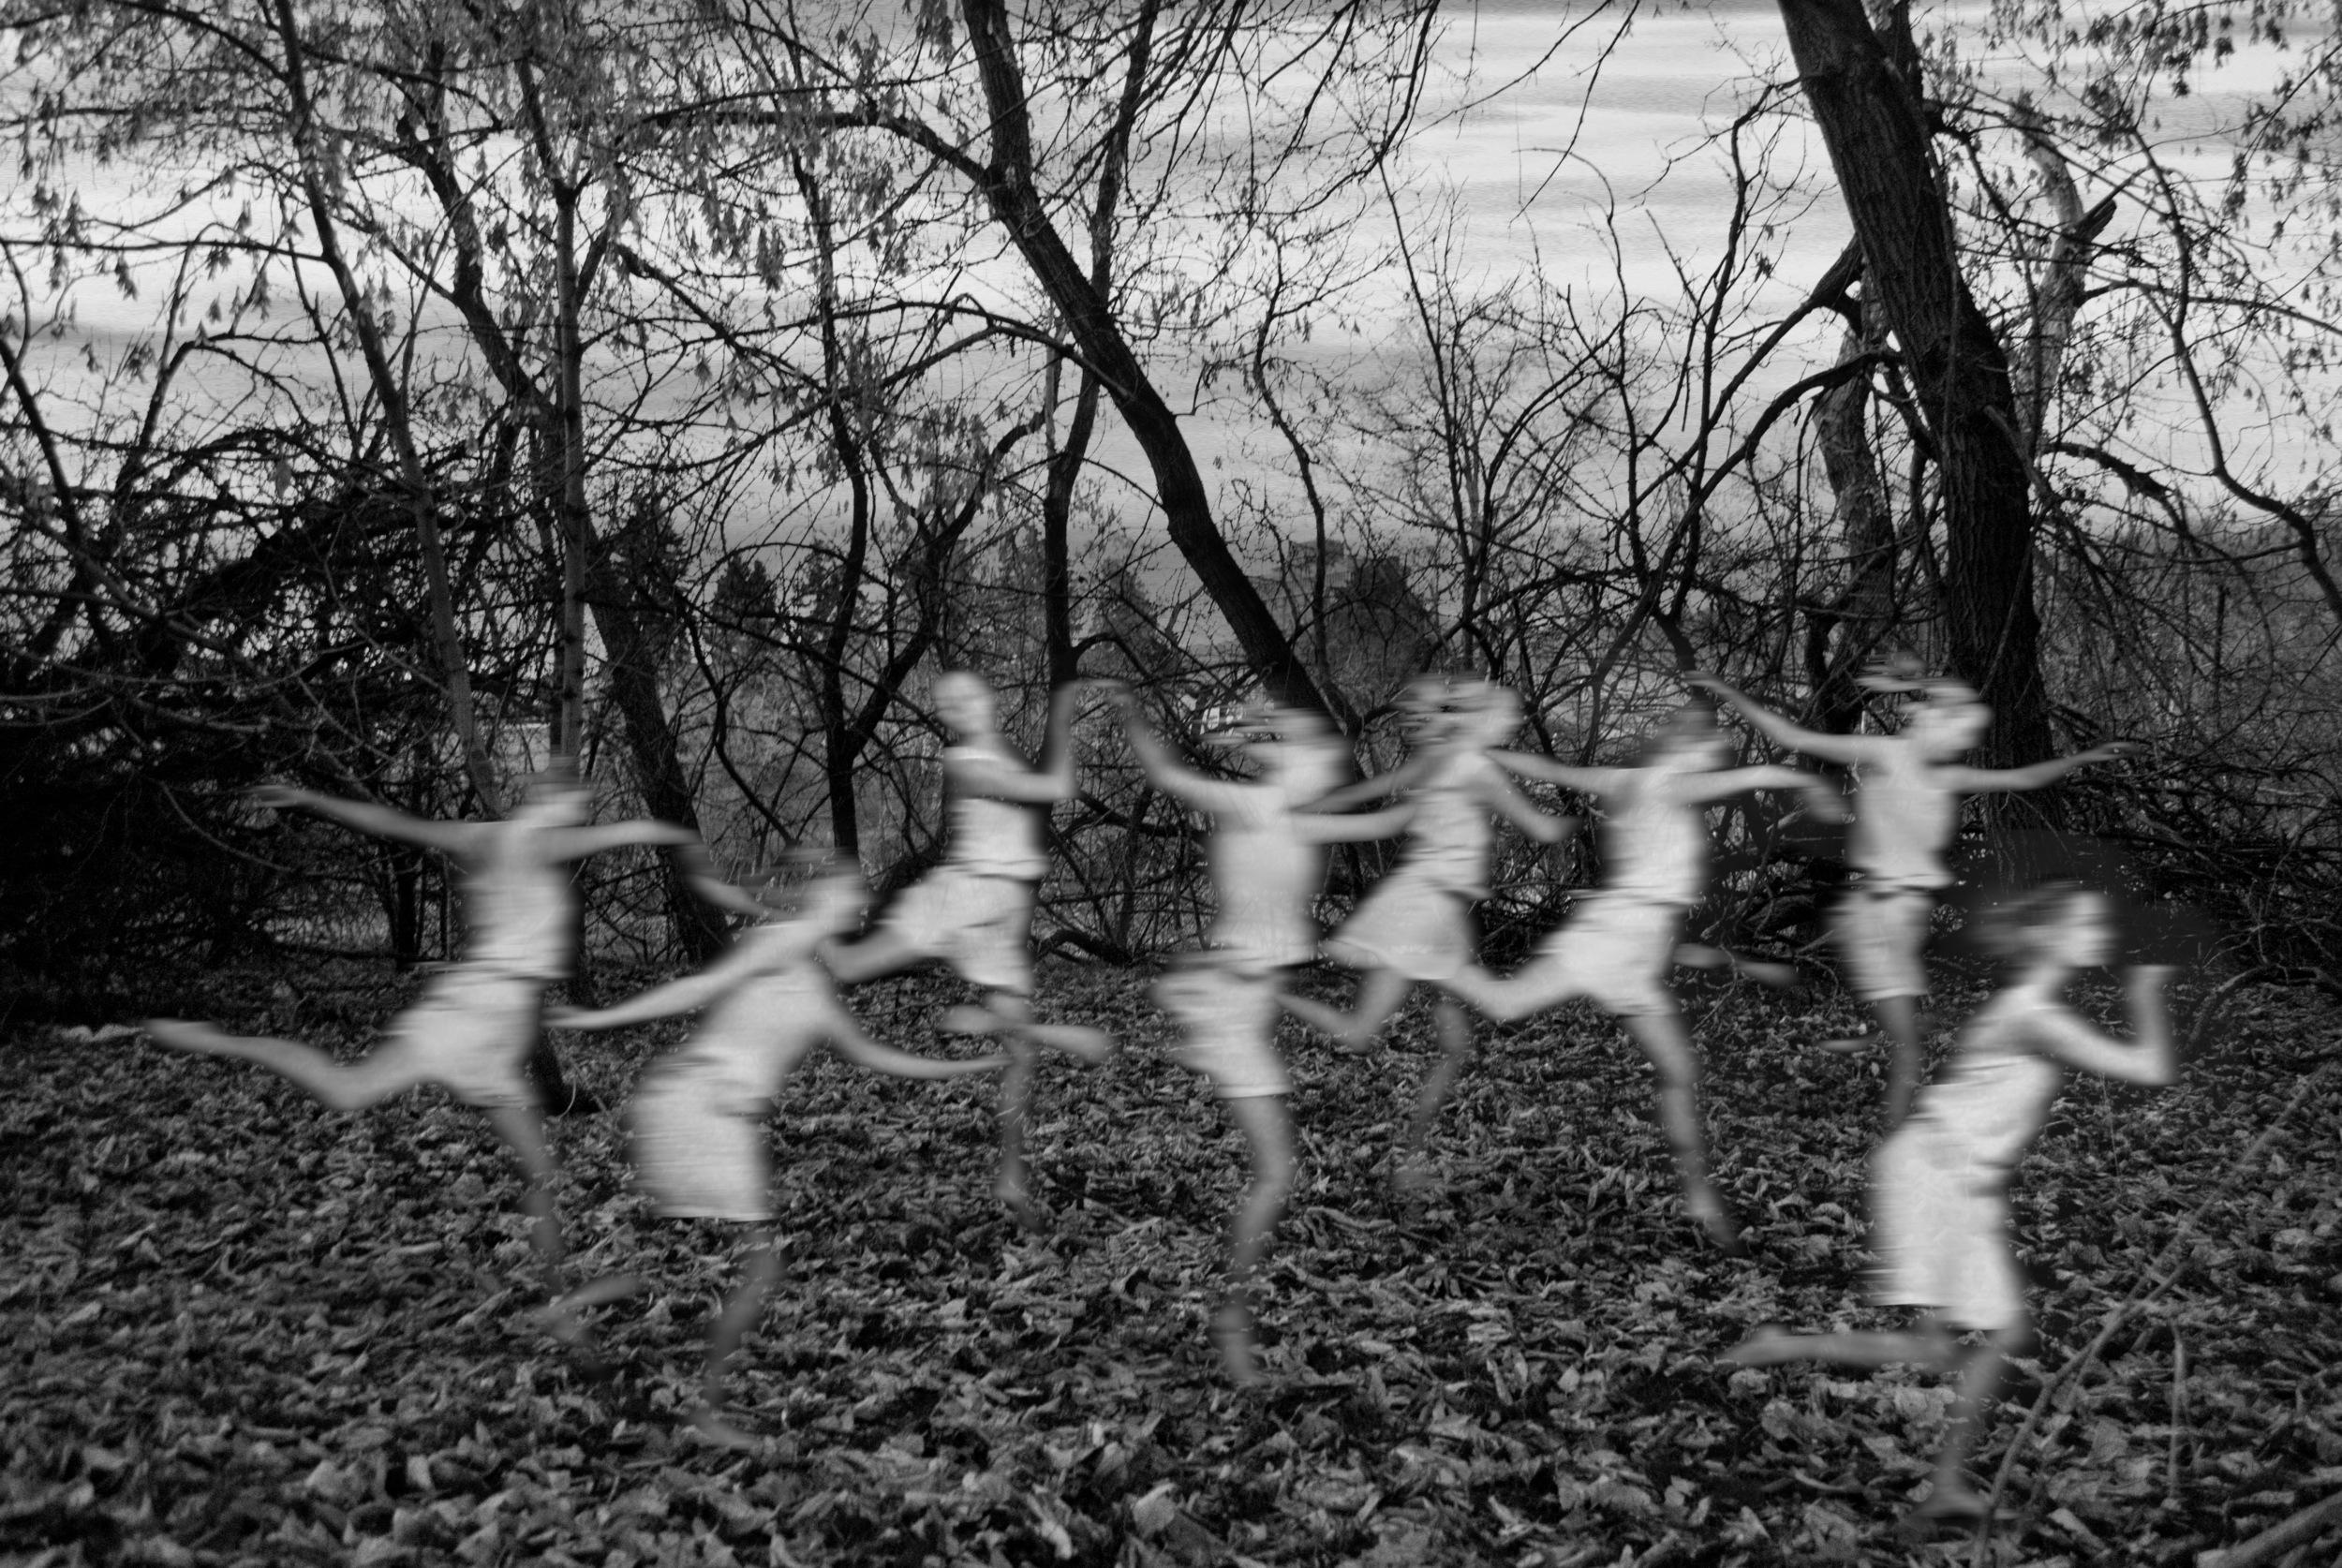 "Karalee Kuchar  Student, Art MFA  Free to Imagine, Free to Explore  fine art Hahnemühle photo rag print  2010, 18"" x 24"""